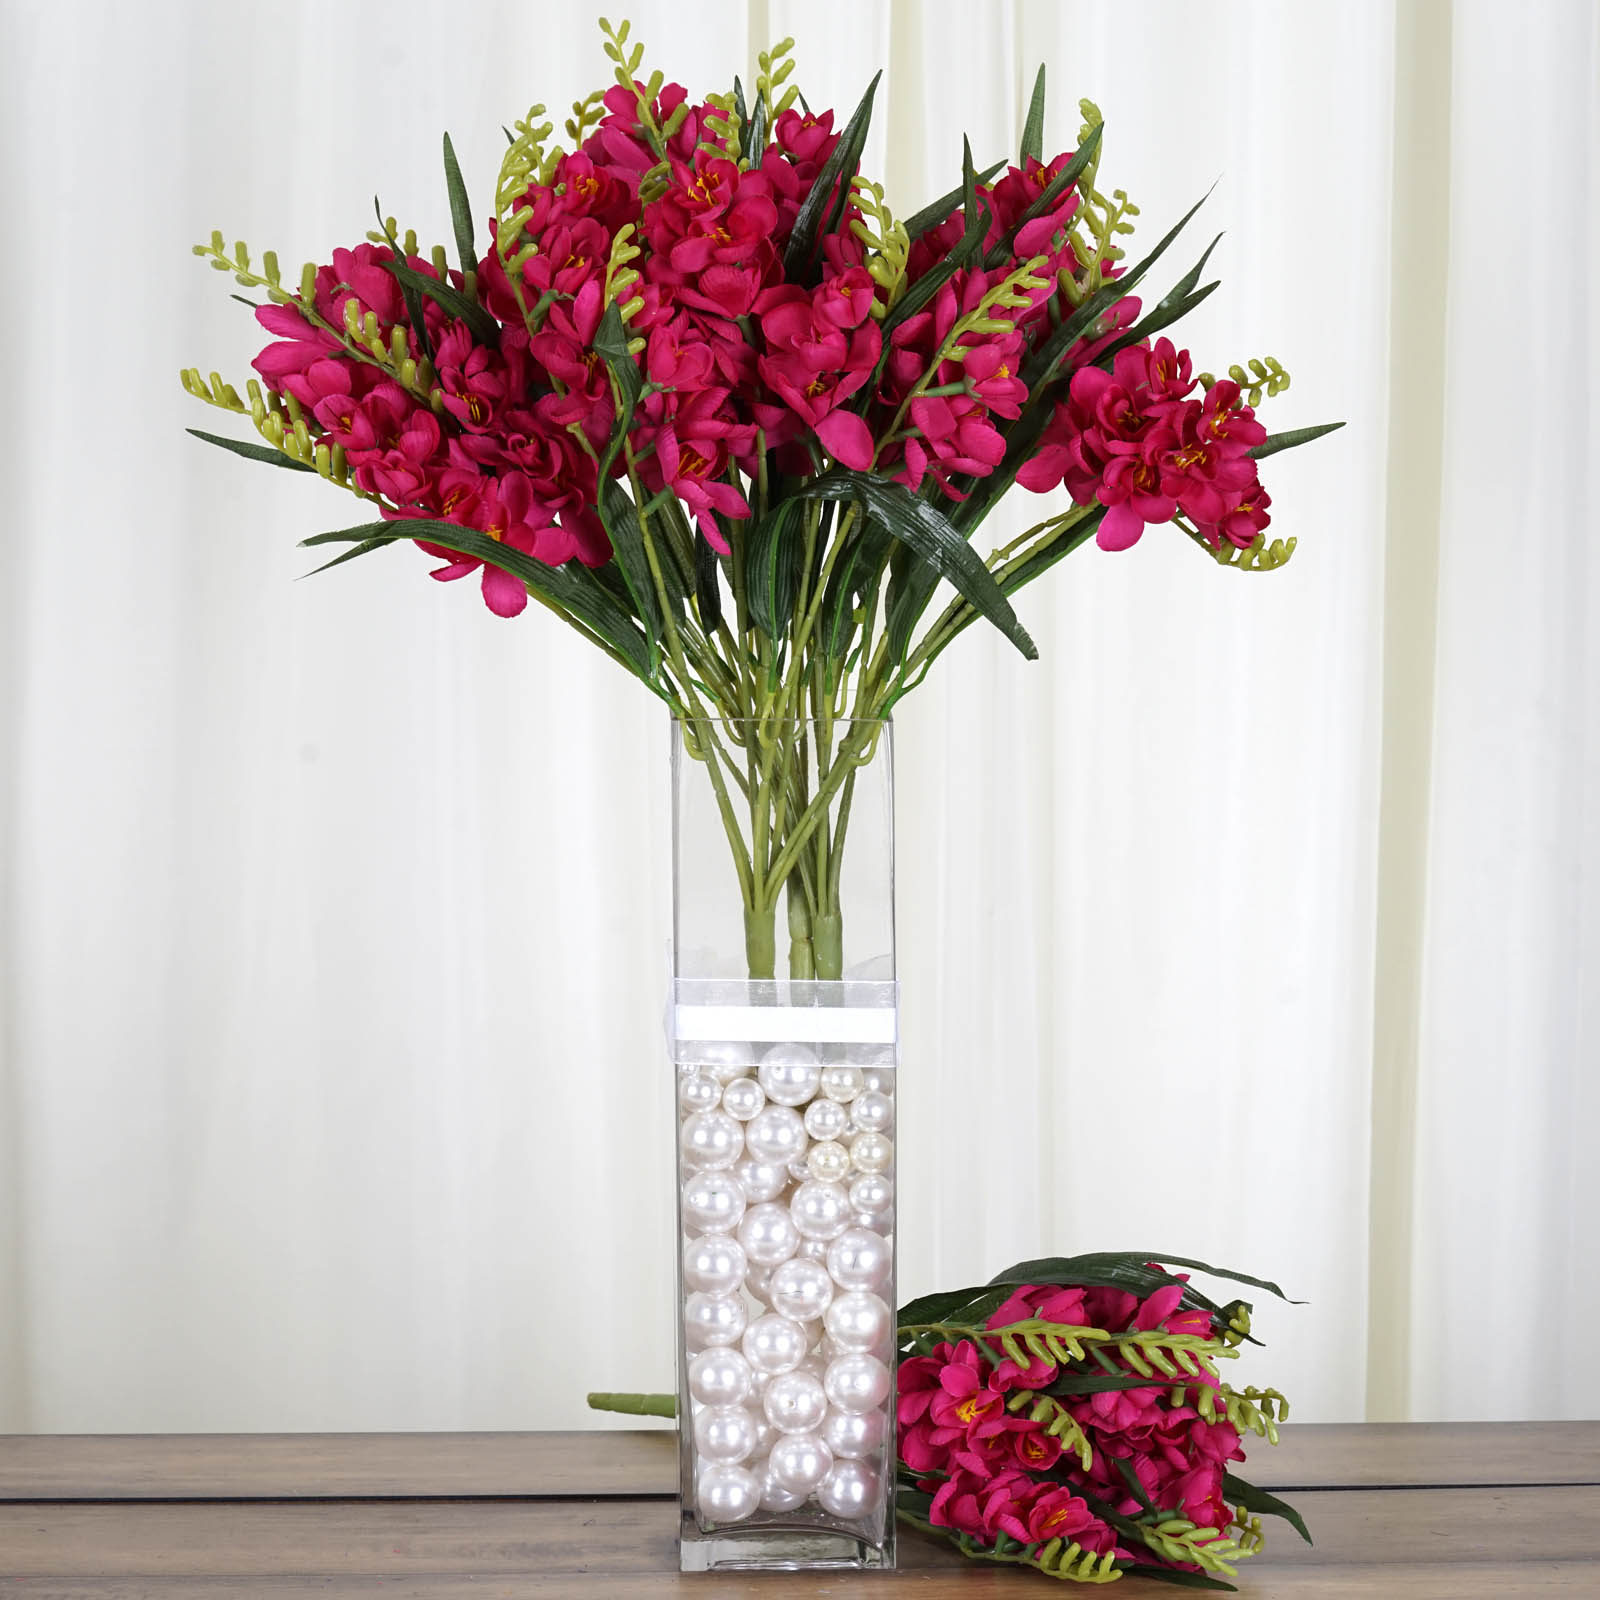 BalsaCircle 216 Silk Freesia Silk Flowers - DIY Home Wedding Party Artificial Bouquets Arrangements Centerpieces